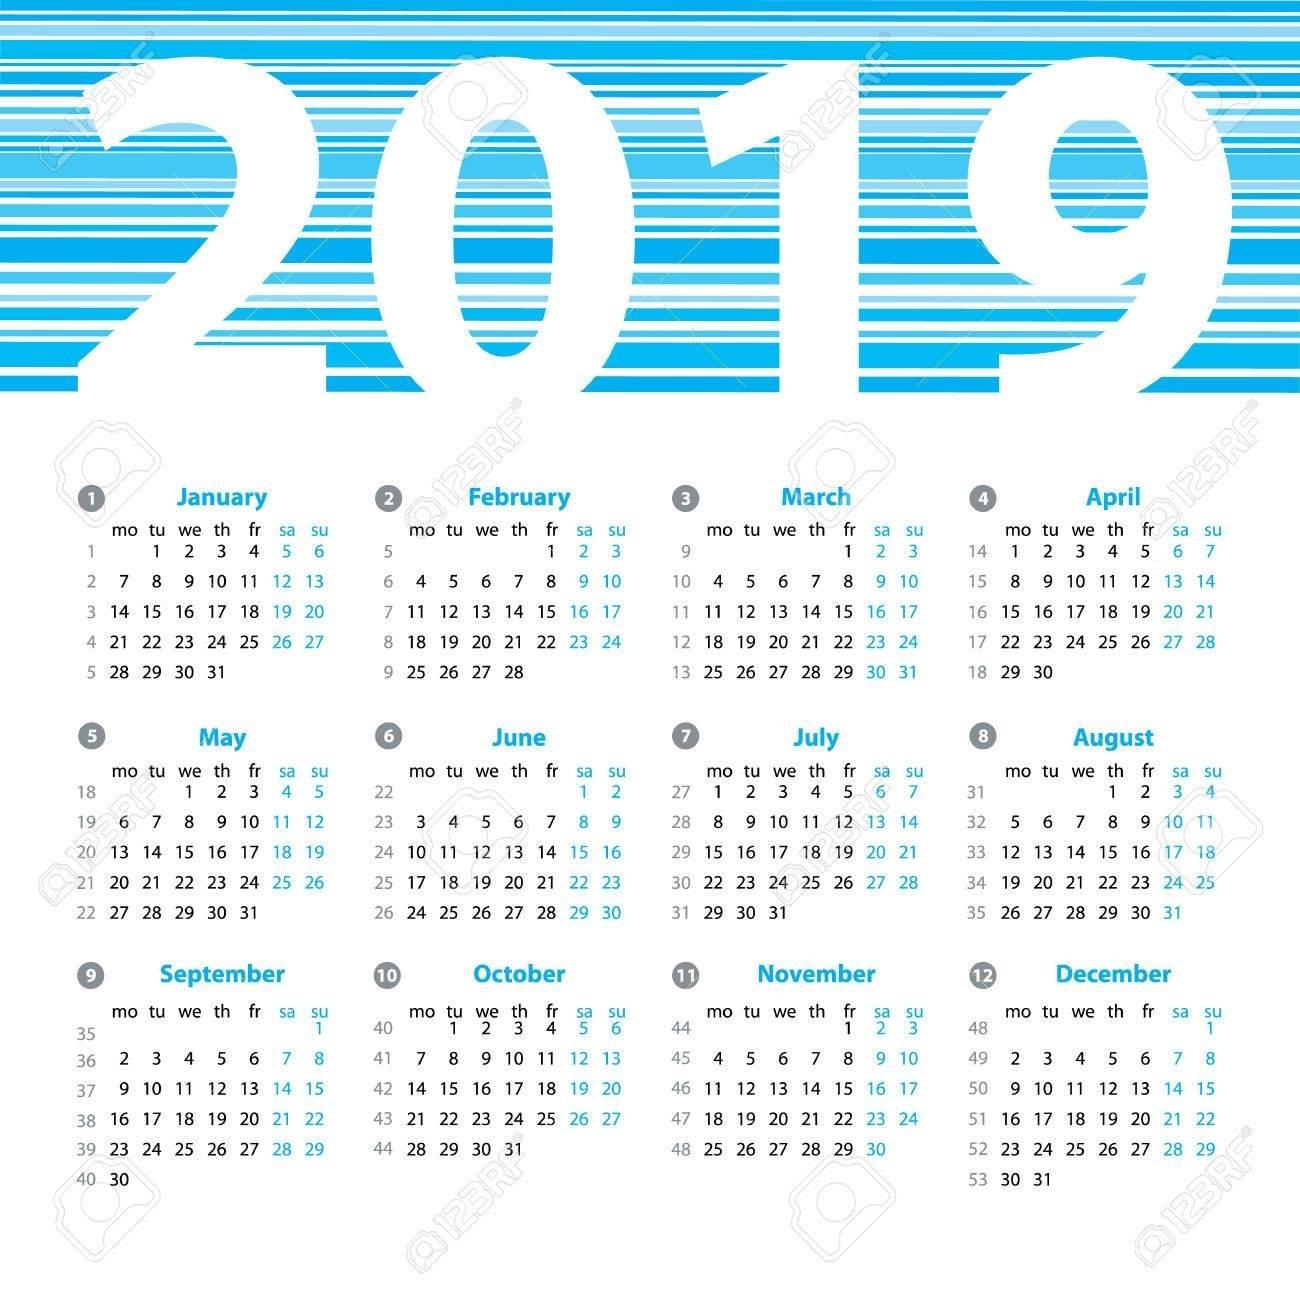 Calendar 2019 Year Vector Design Template With Week Numbers And Calendar Week 36 2019